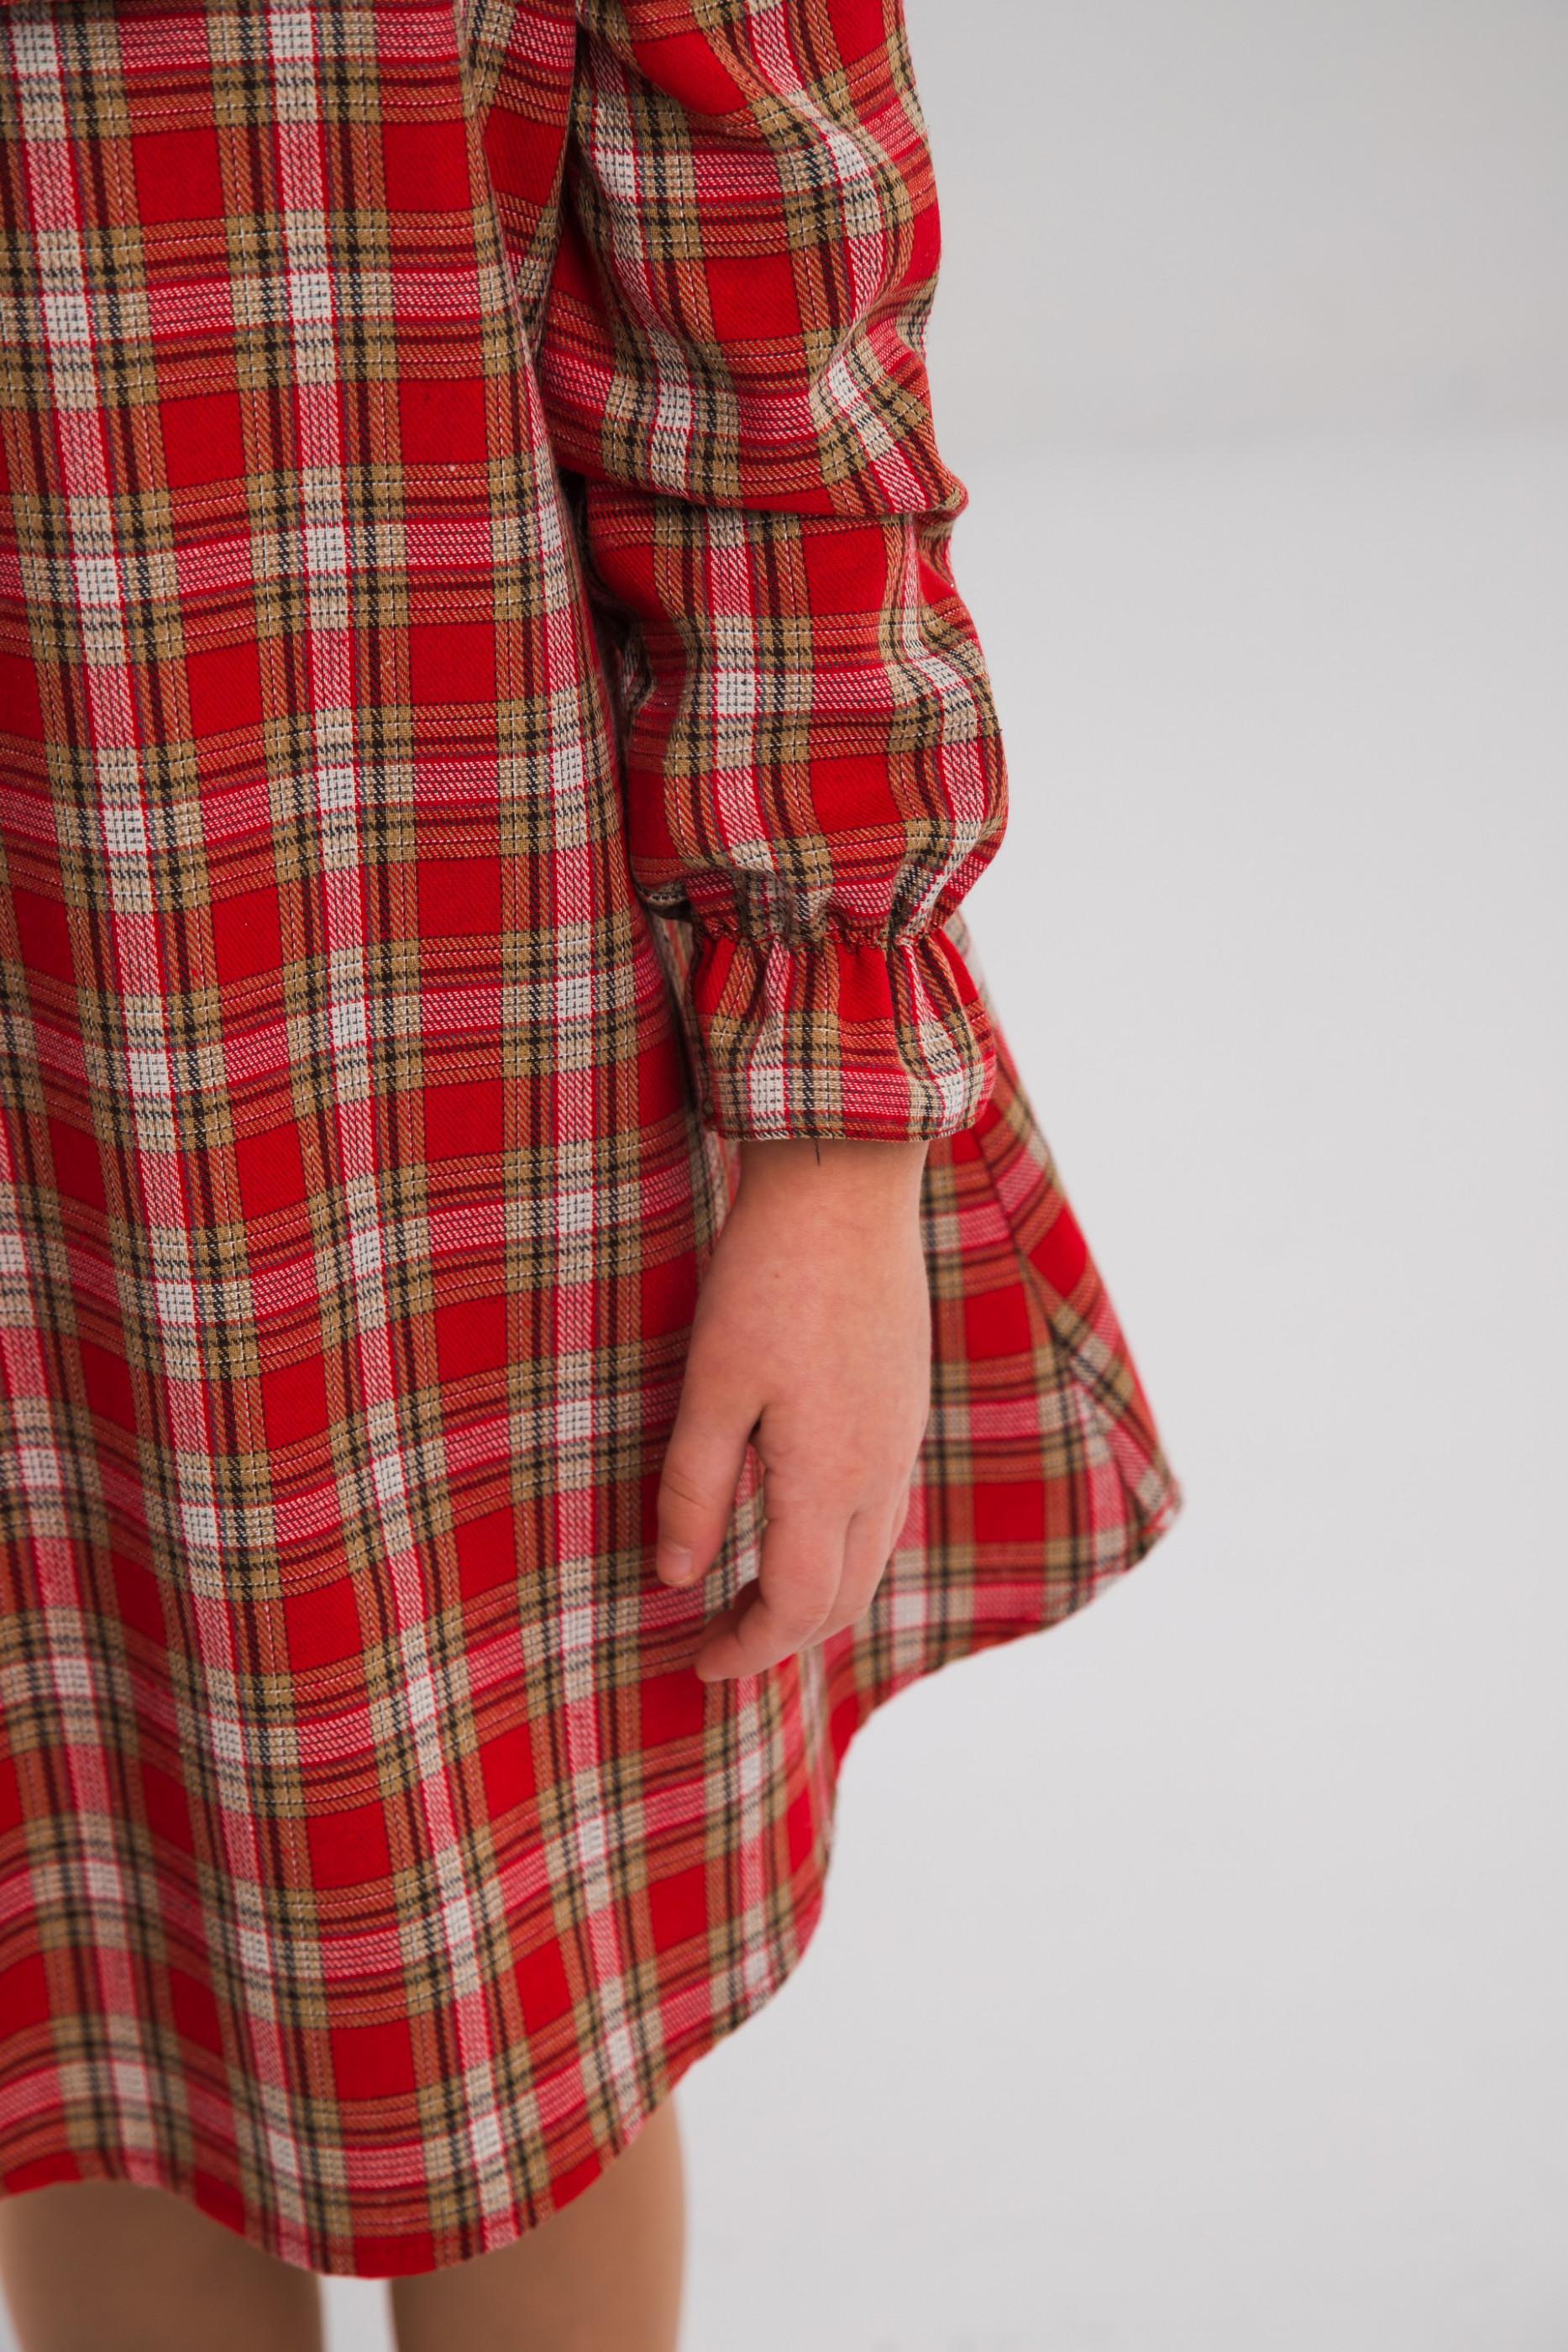 Плаття Хезер, фото №2